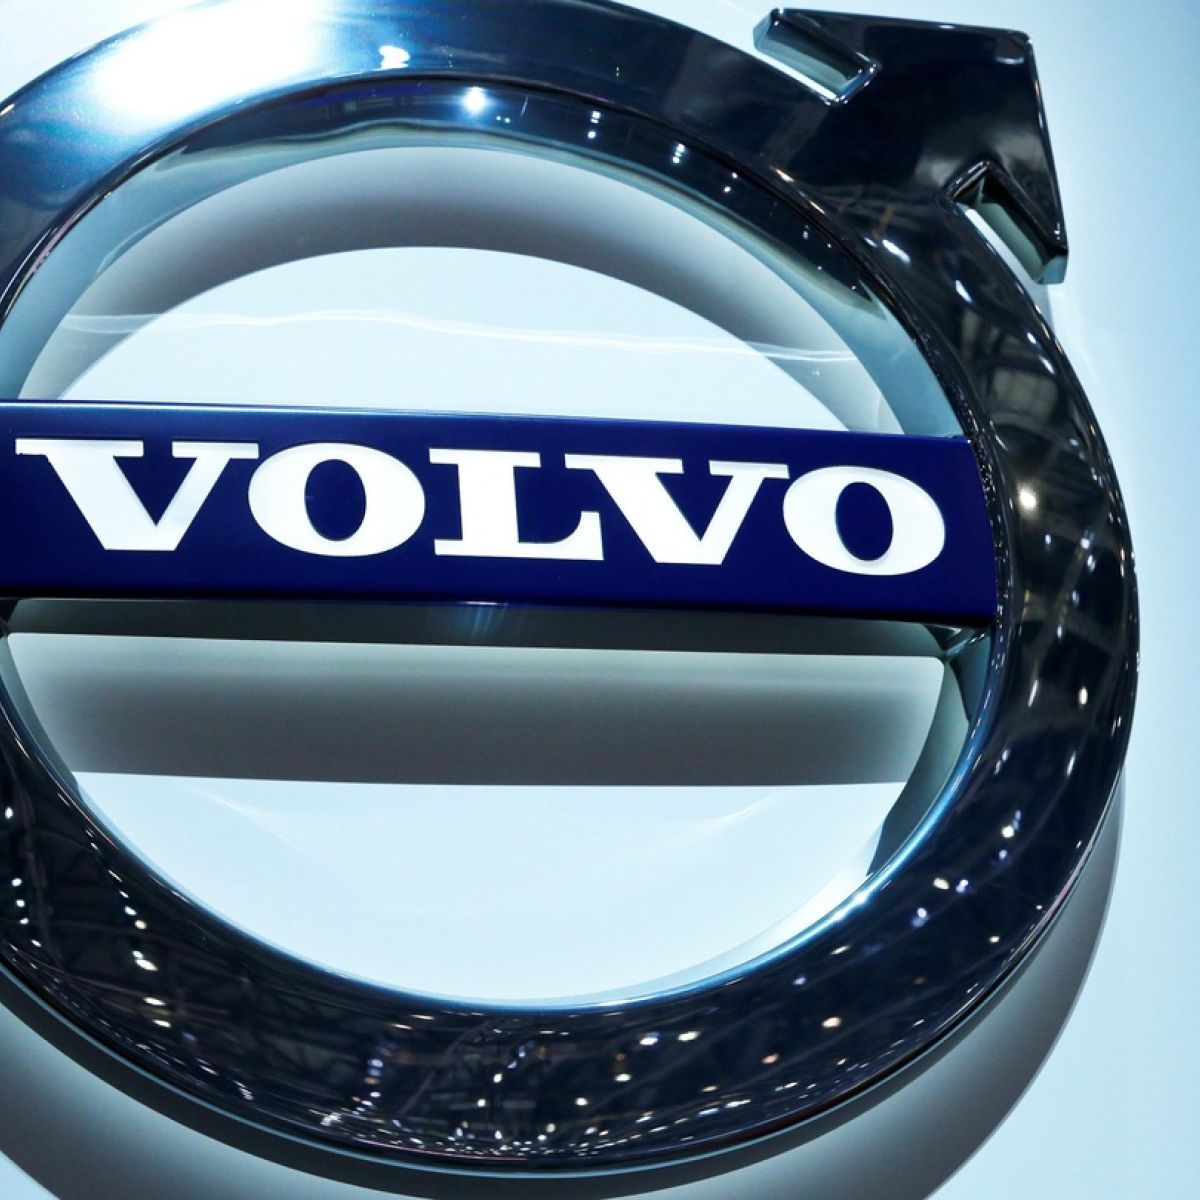 Petrol Engines So Yesterday Says Volvo